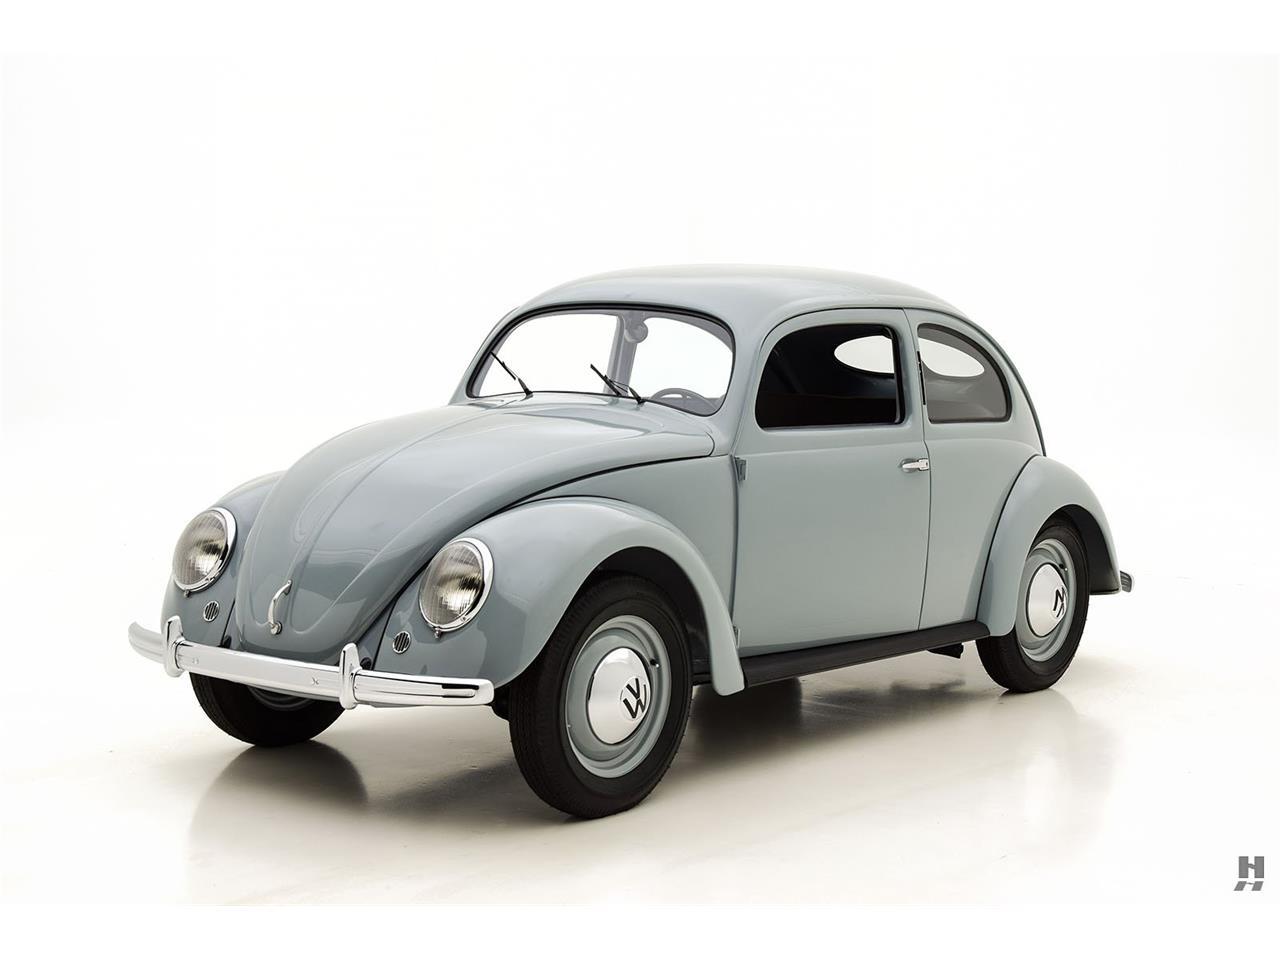 for sale 1949 volkswagen beetle in saint louis, missouri cars - saint louis, mo at geebo